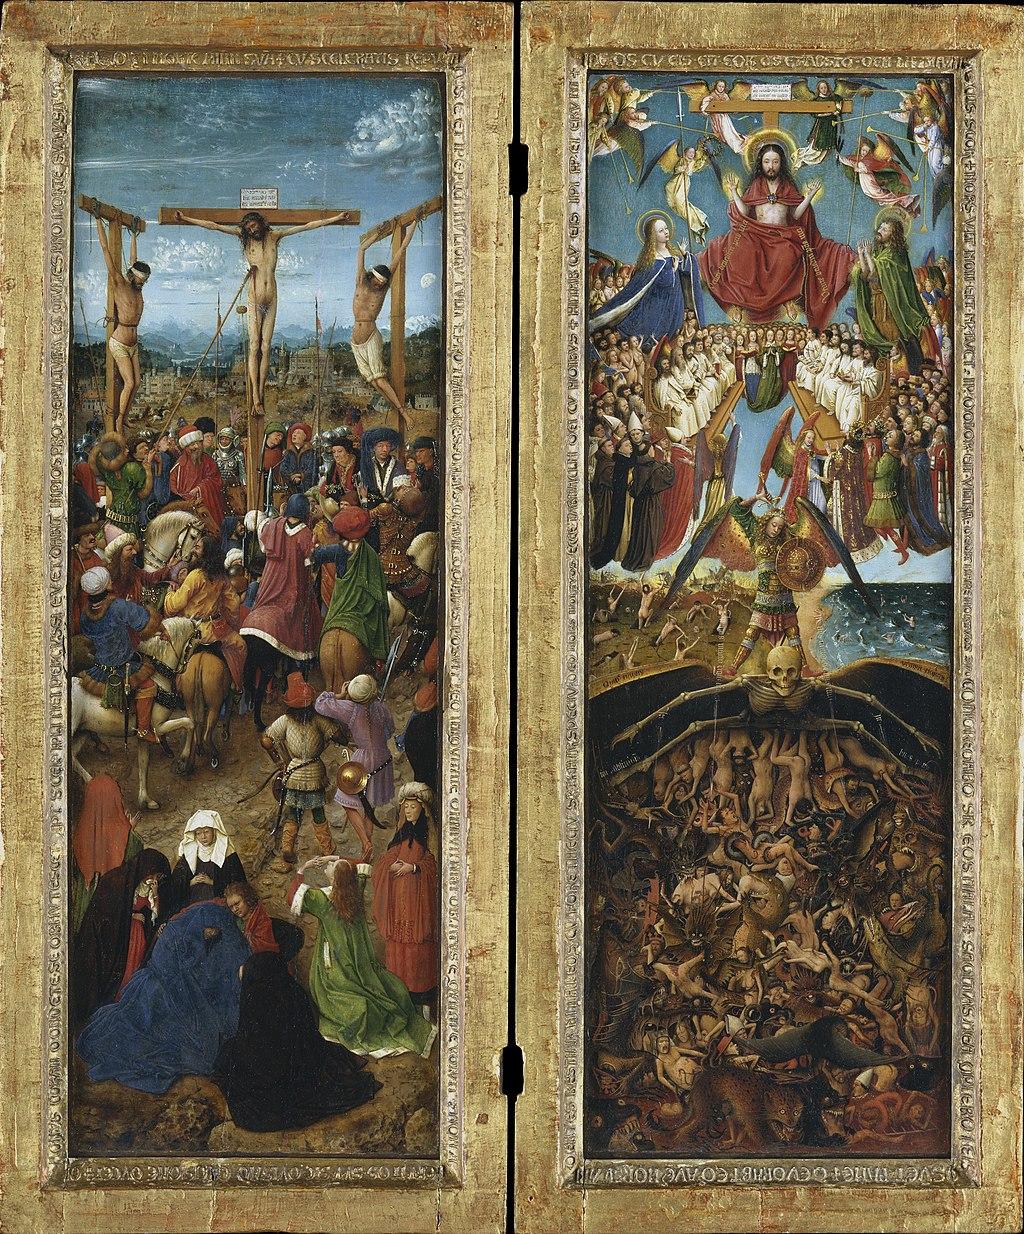 Van Eyck - The Crucifixion; The Last Judgment